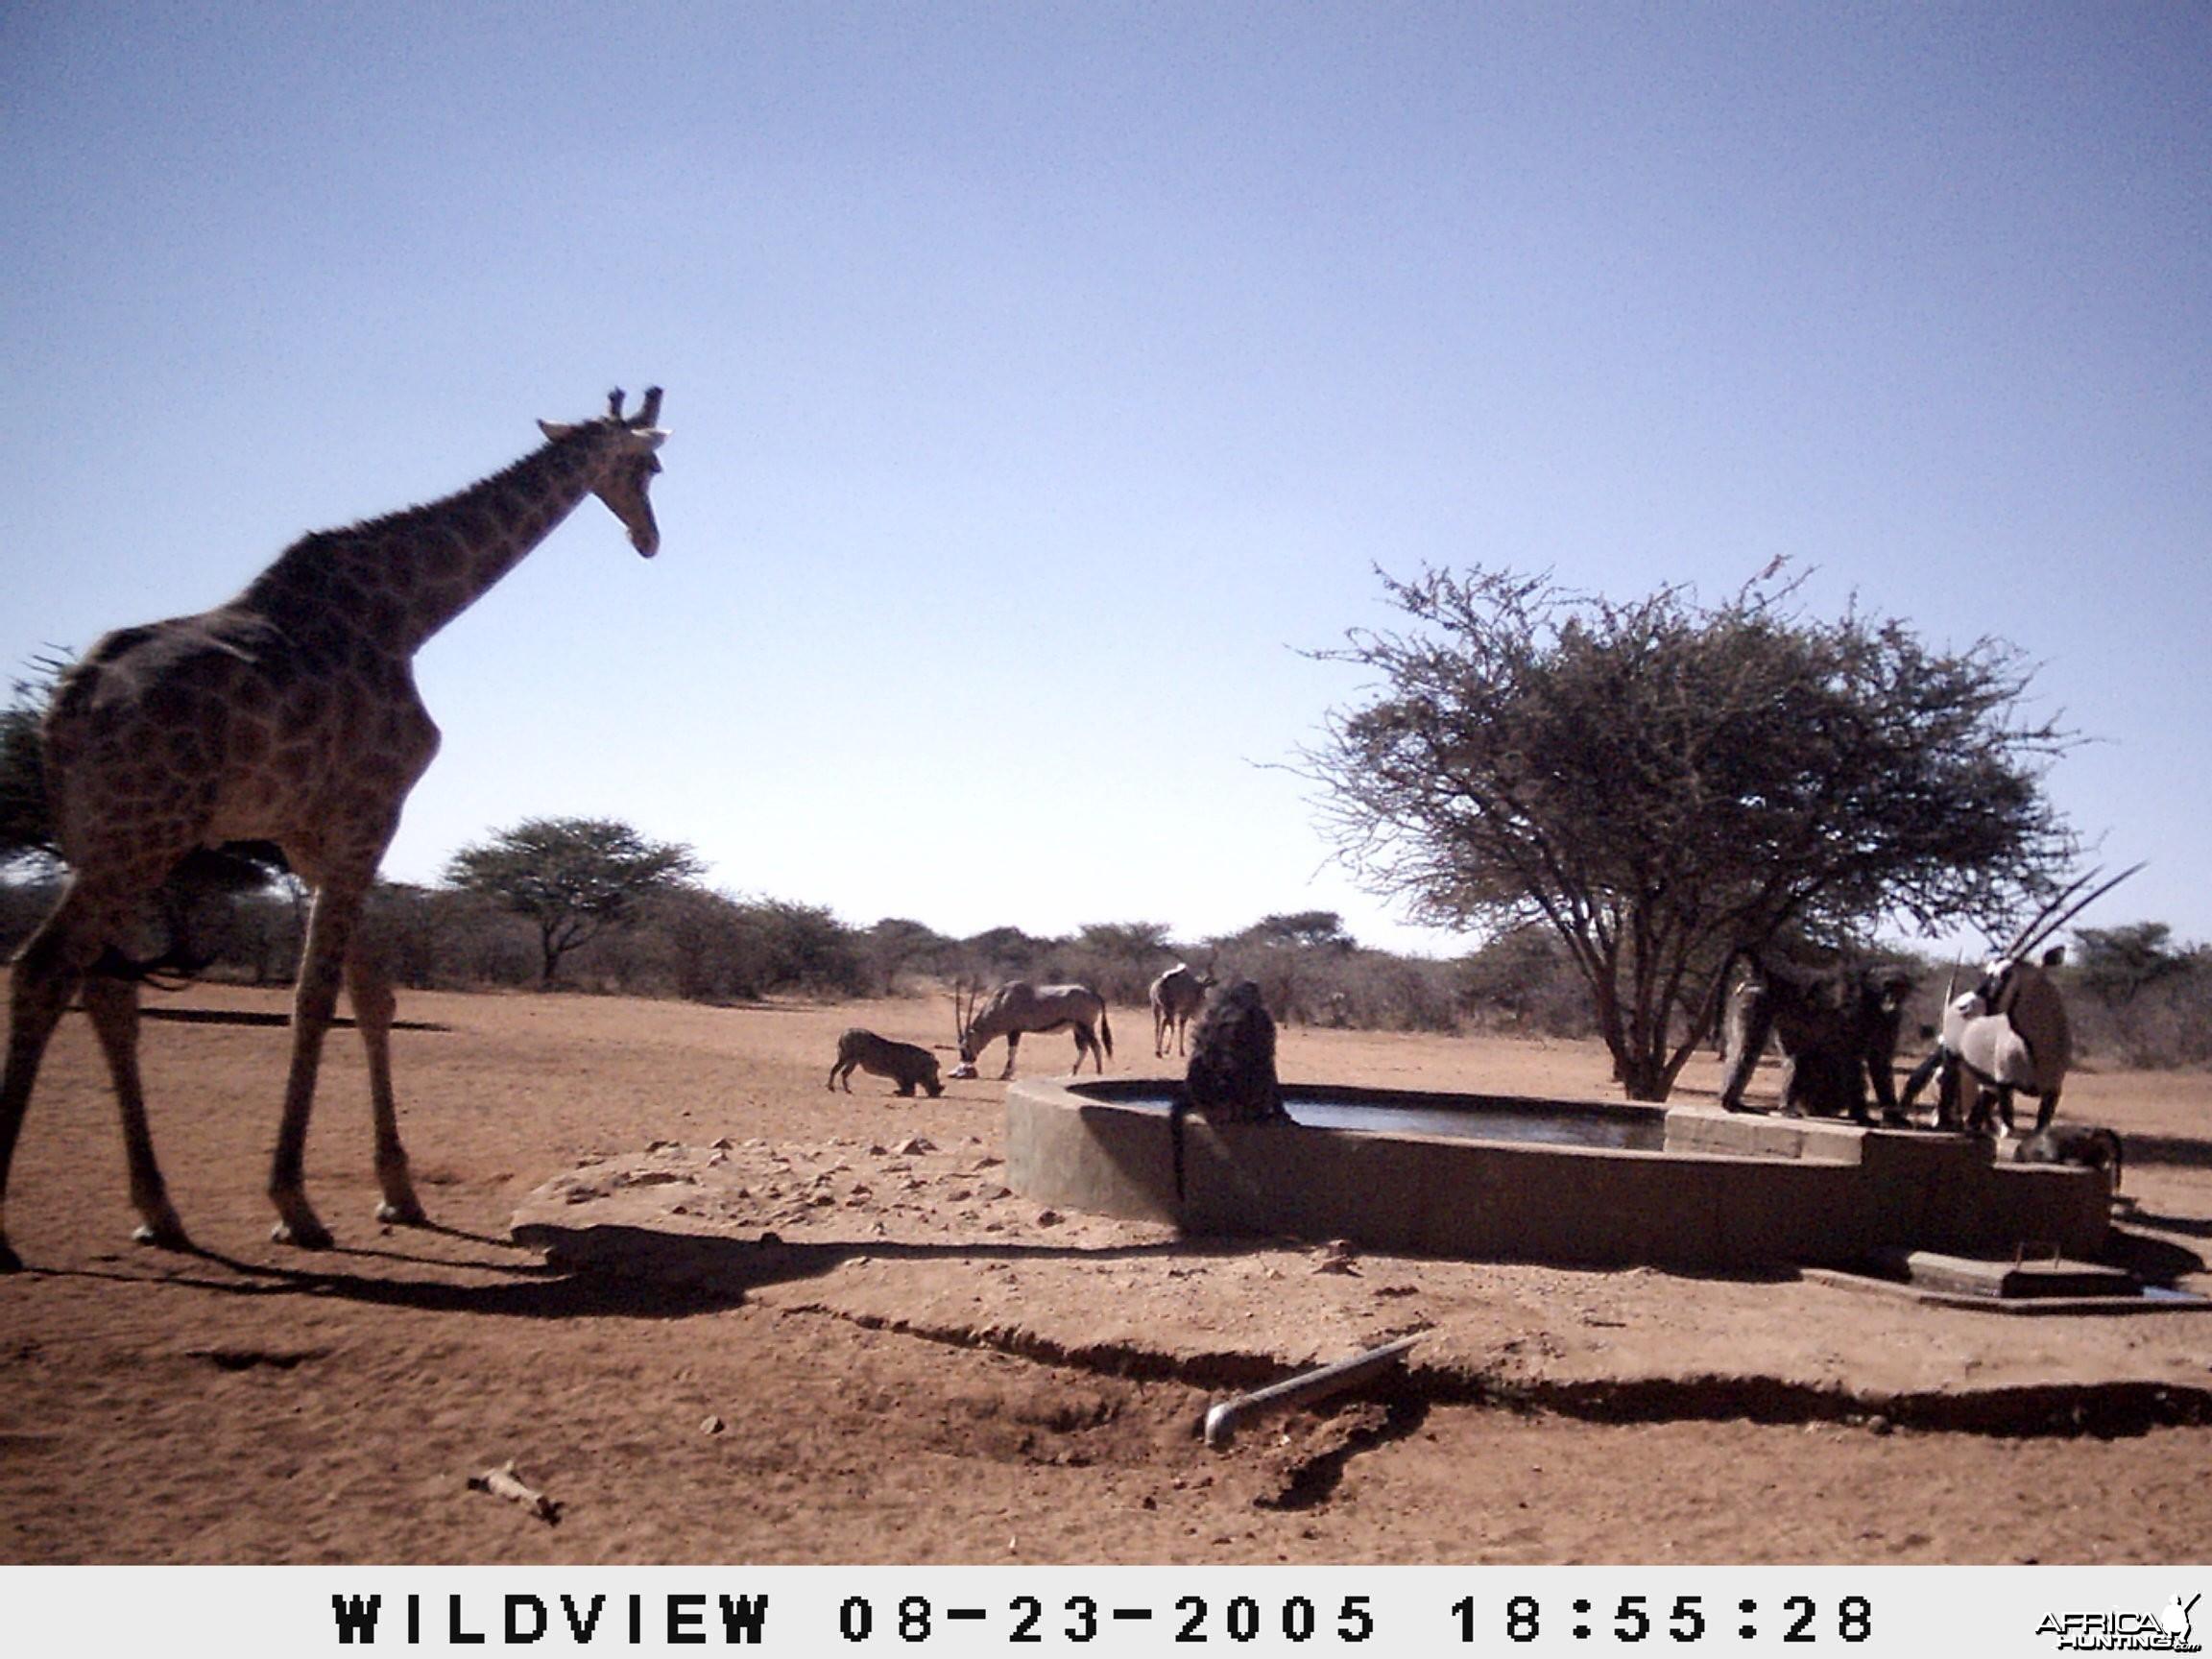 Gemsboks, Giraffes, baboons, Kudu and Baboons, Namibia